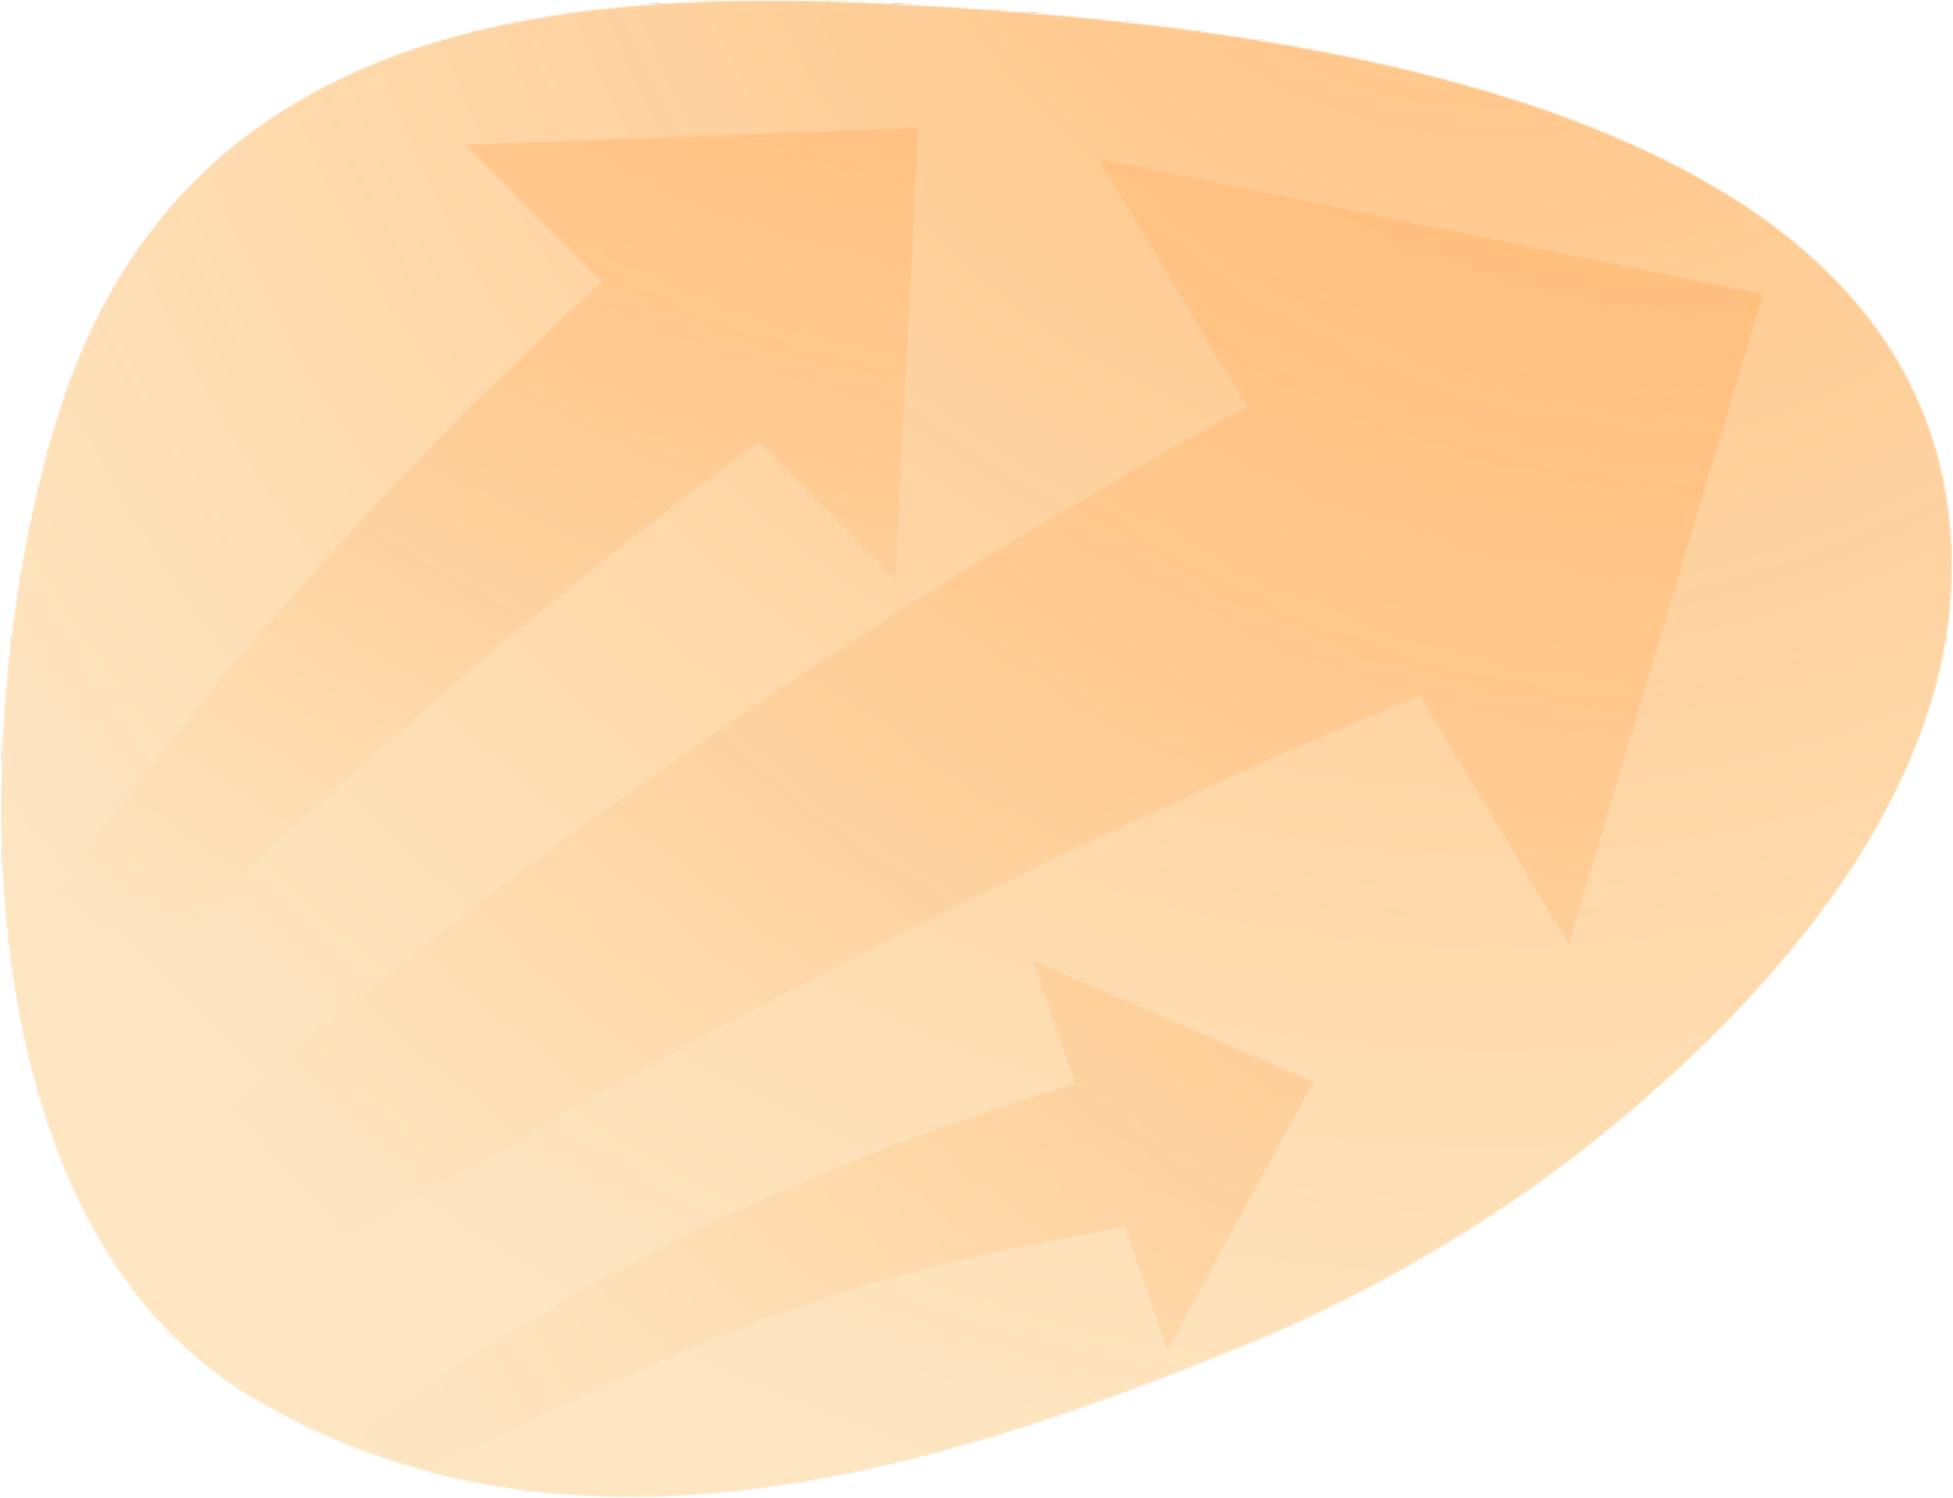 Webbhandelsfokus